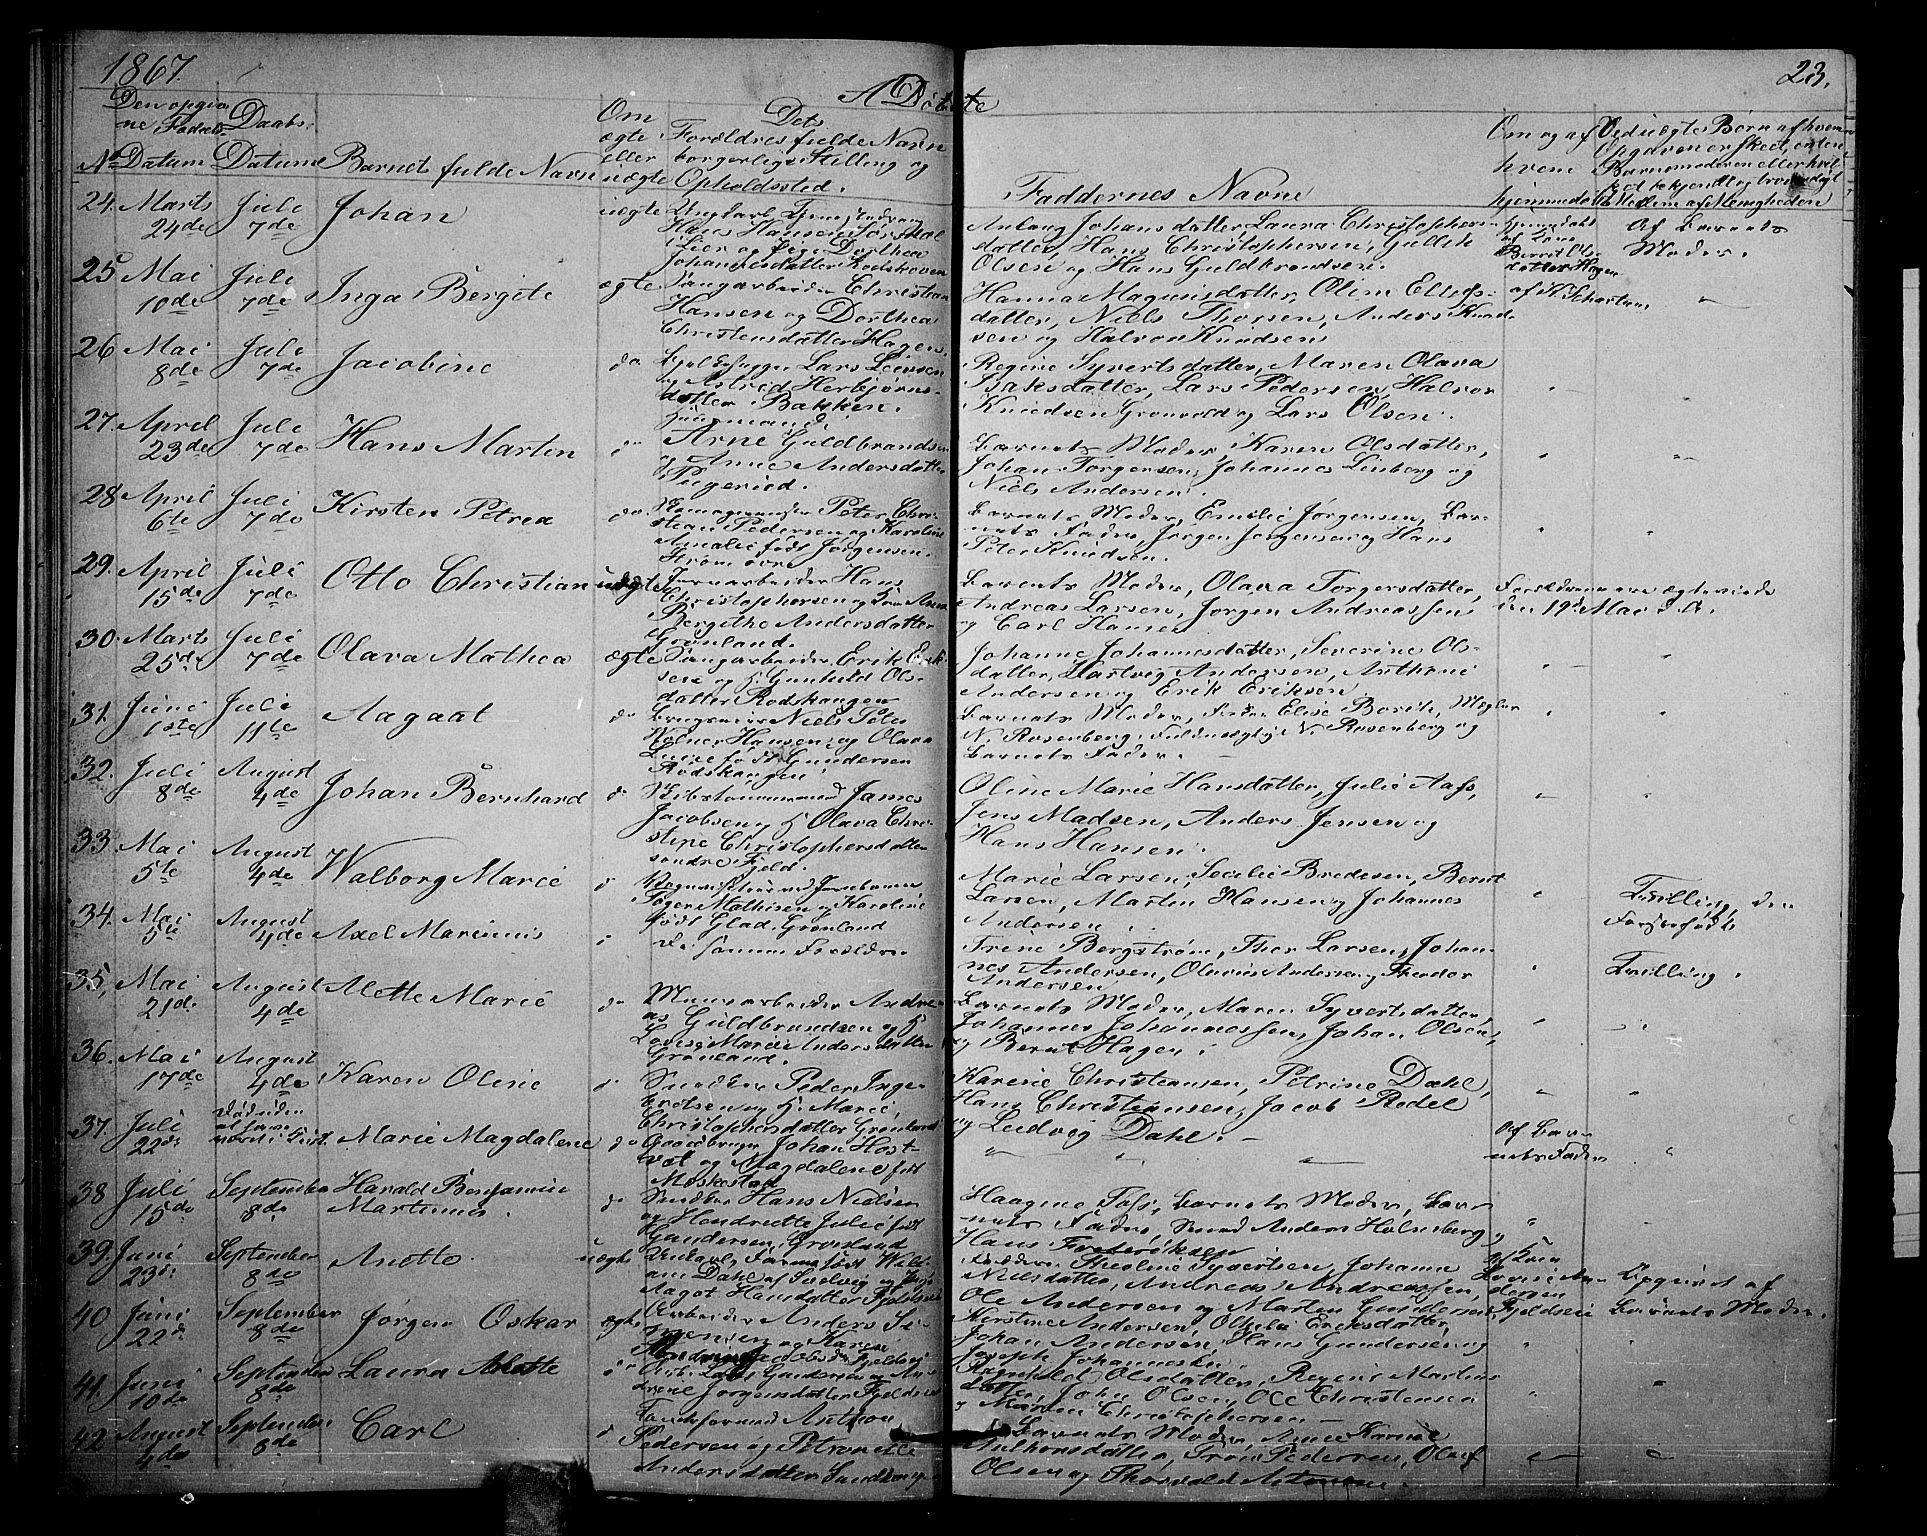 SAKO, Strømsgodset kirkebøker, G/Ga/L0001: Klokkerbok nr. 1, 1860-1884, s. 23